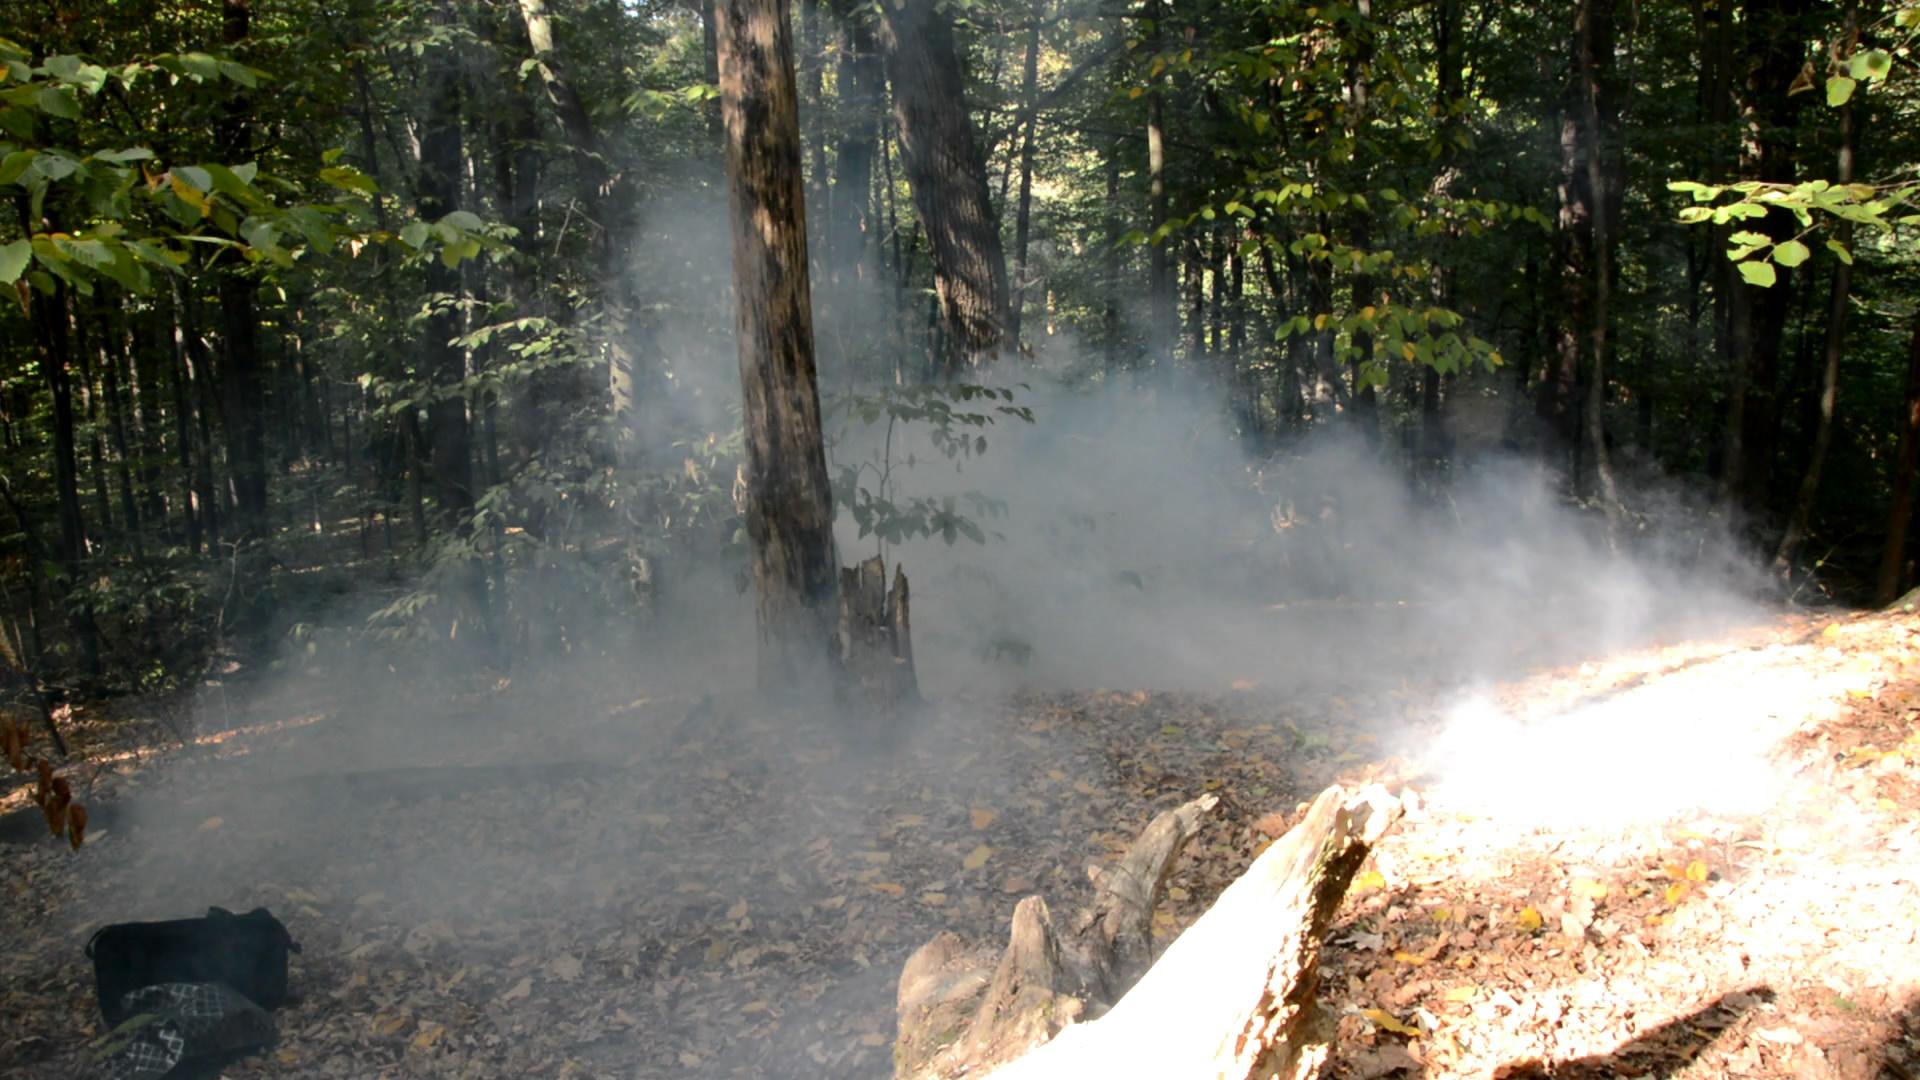 Туман в лесу (реакция соляной кислоты и аммиака) / Reaction of Hydrochloric Acid and Ammonia